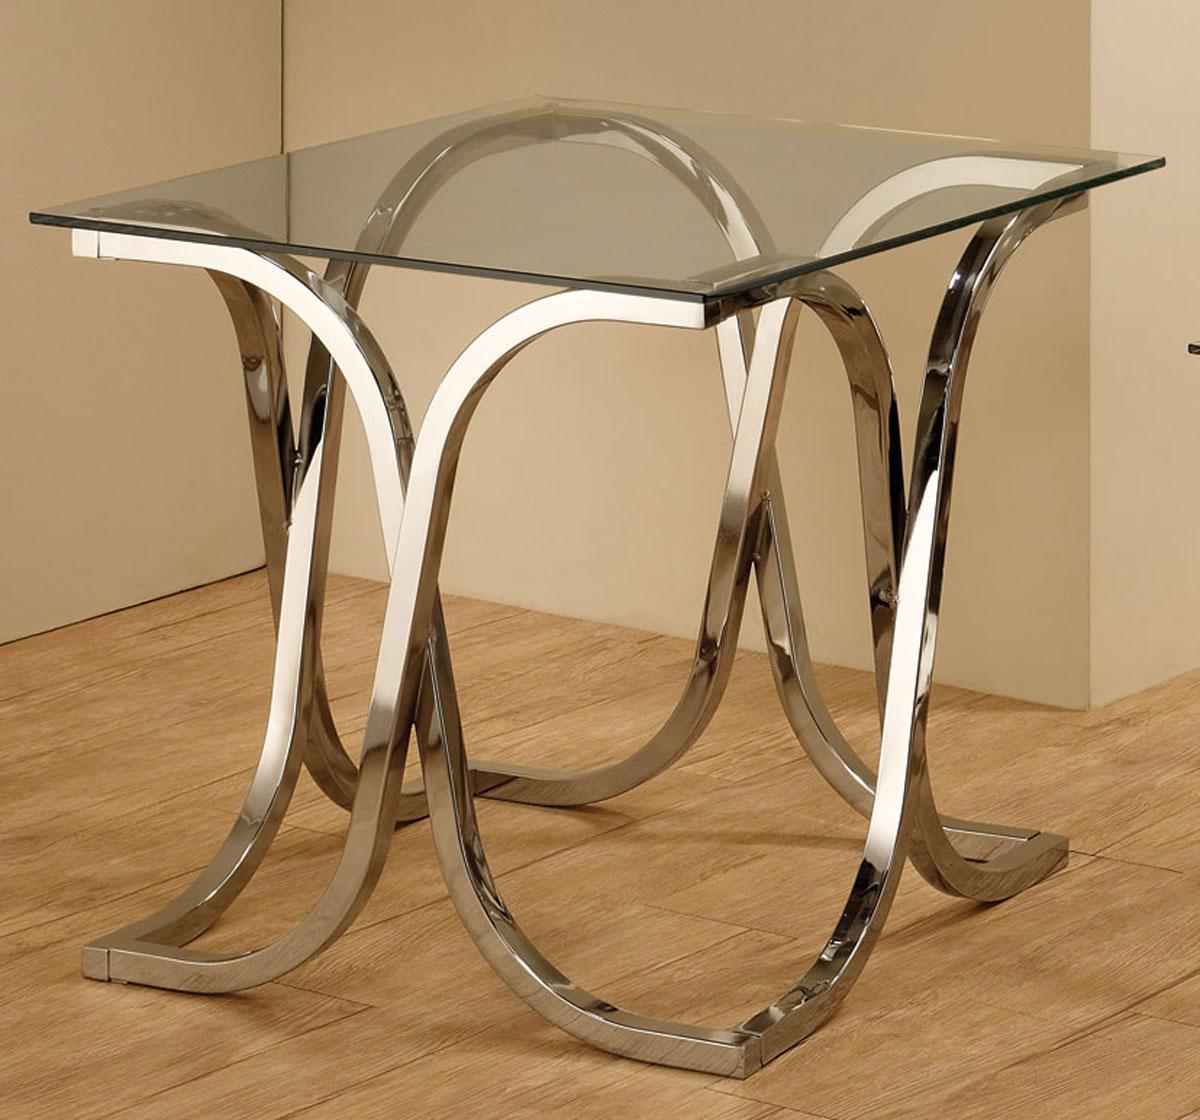 Coaster 701917 End Table - Chrome